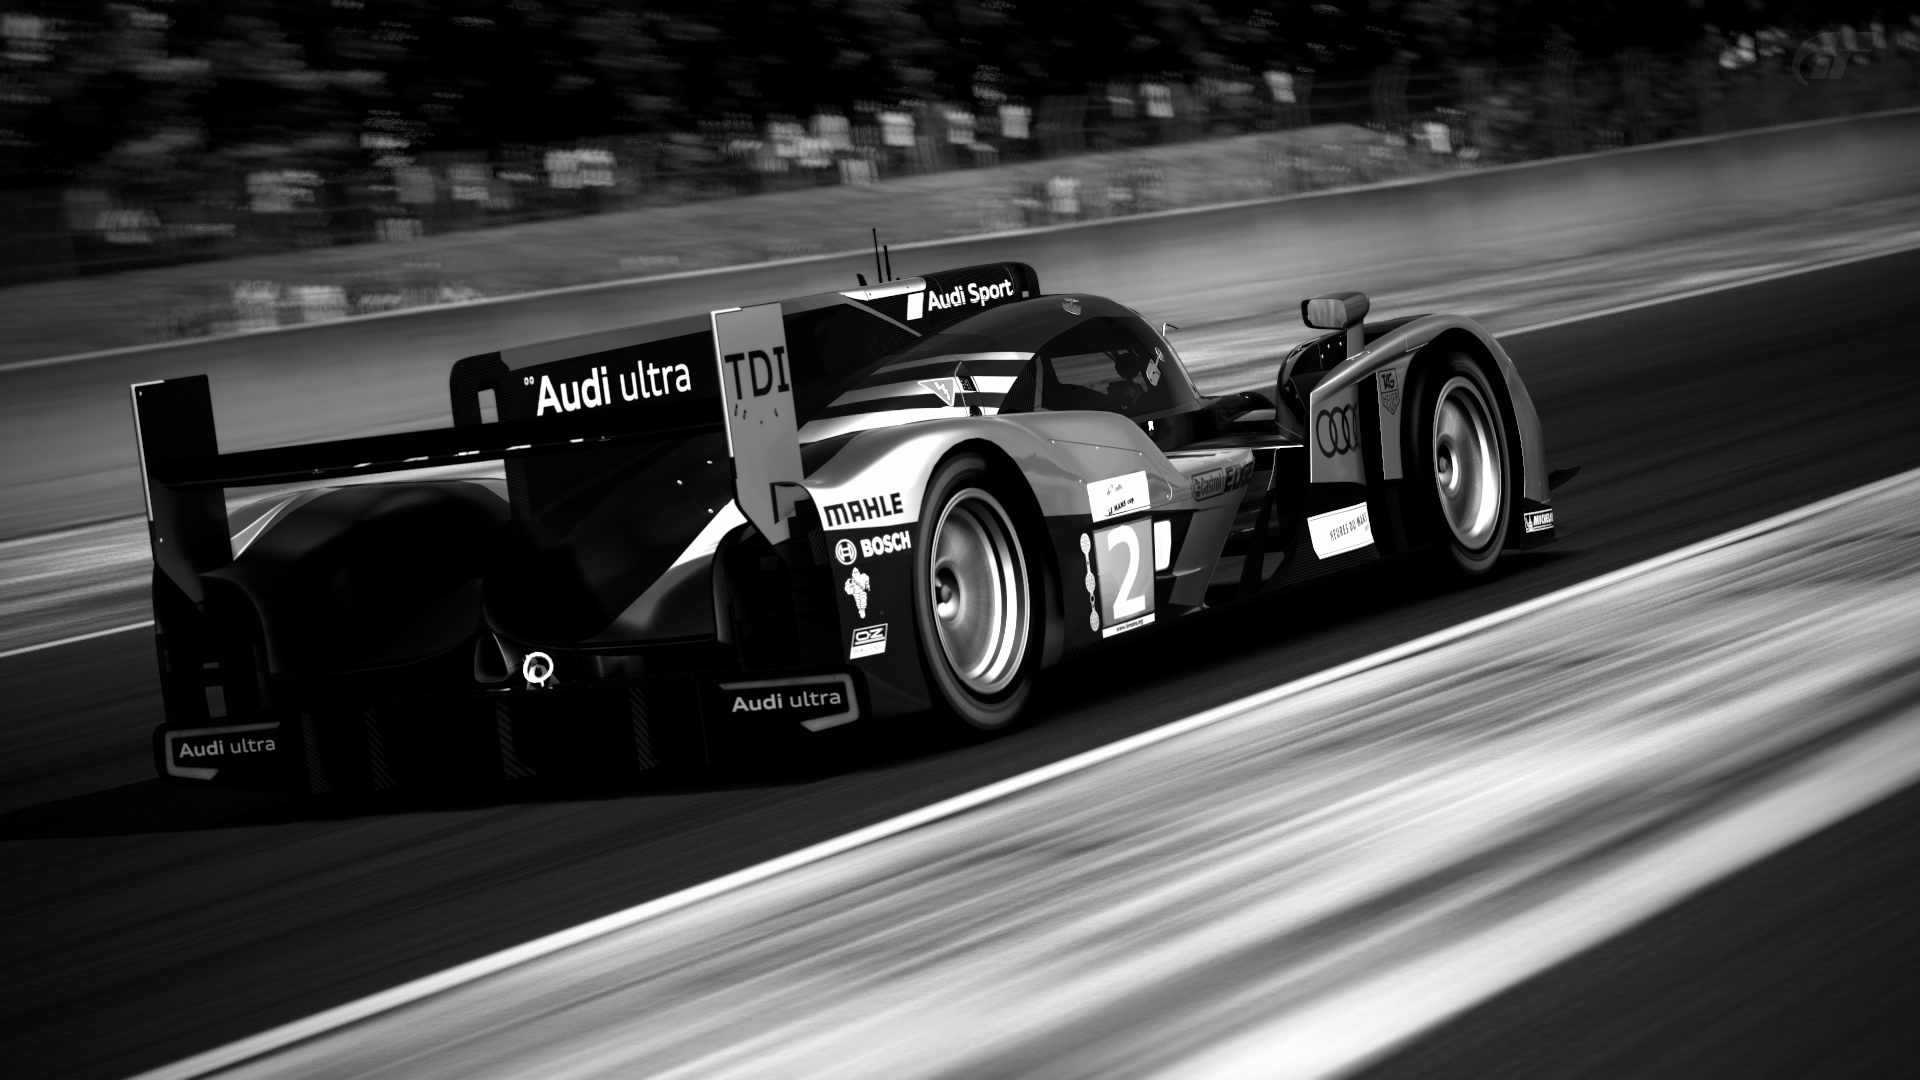 Circuit de la Sarthe 2009_47.jpg